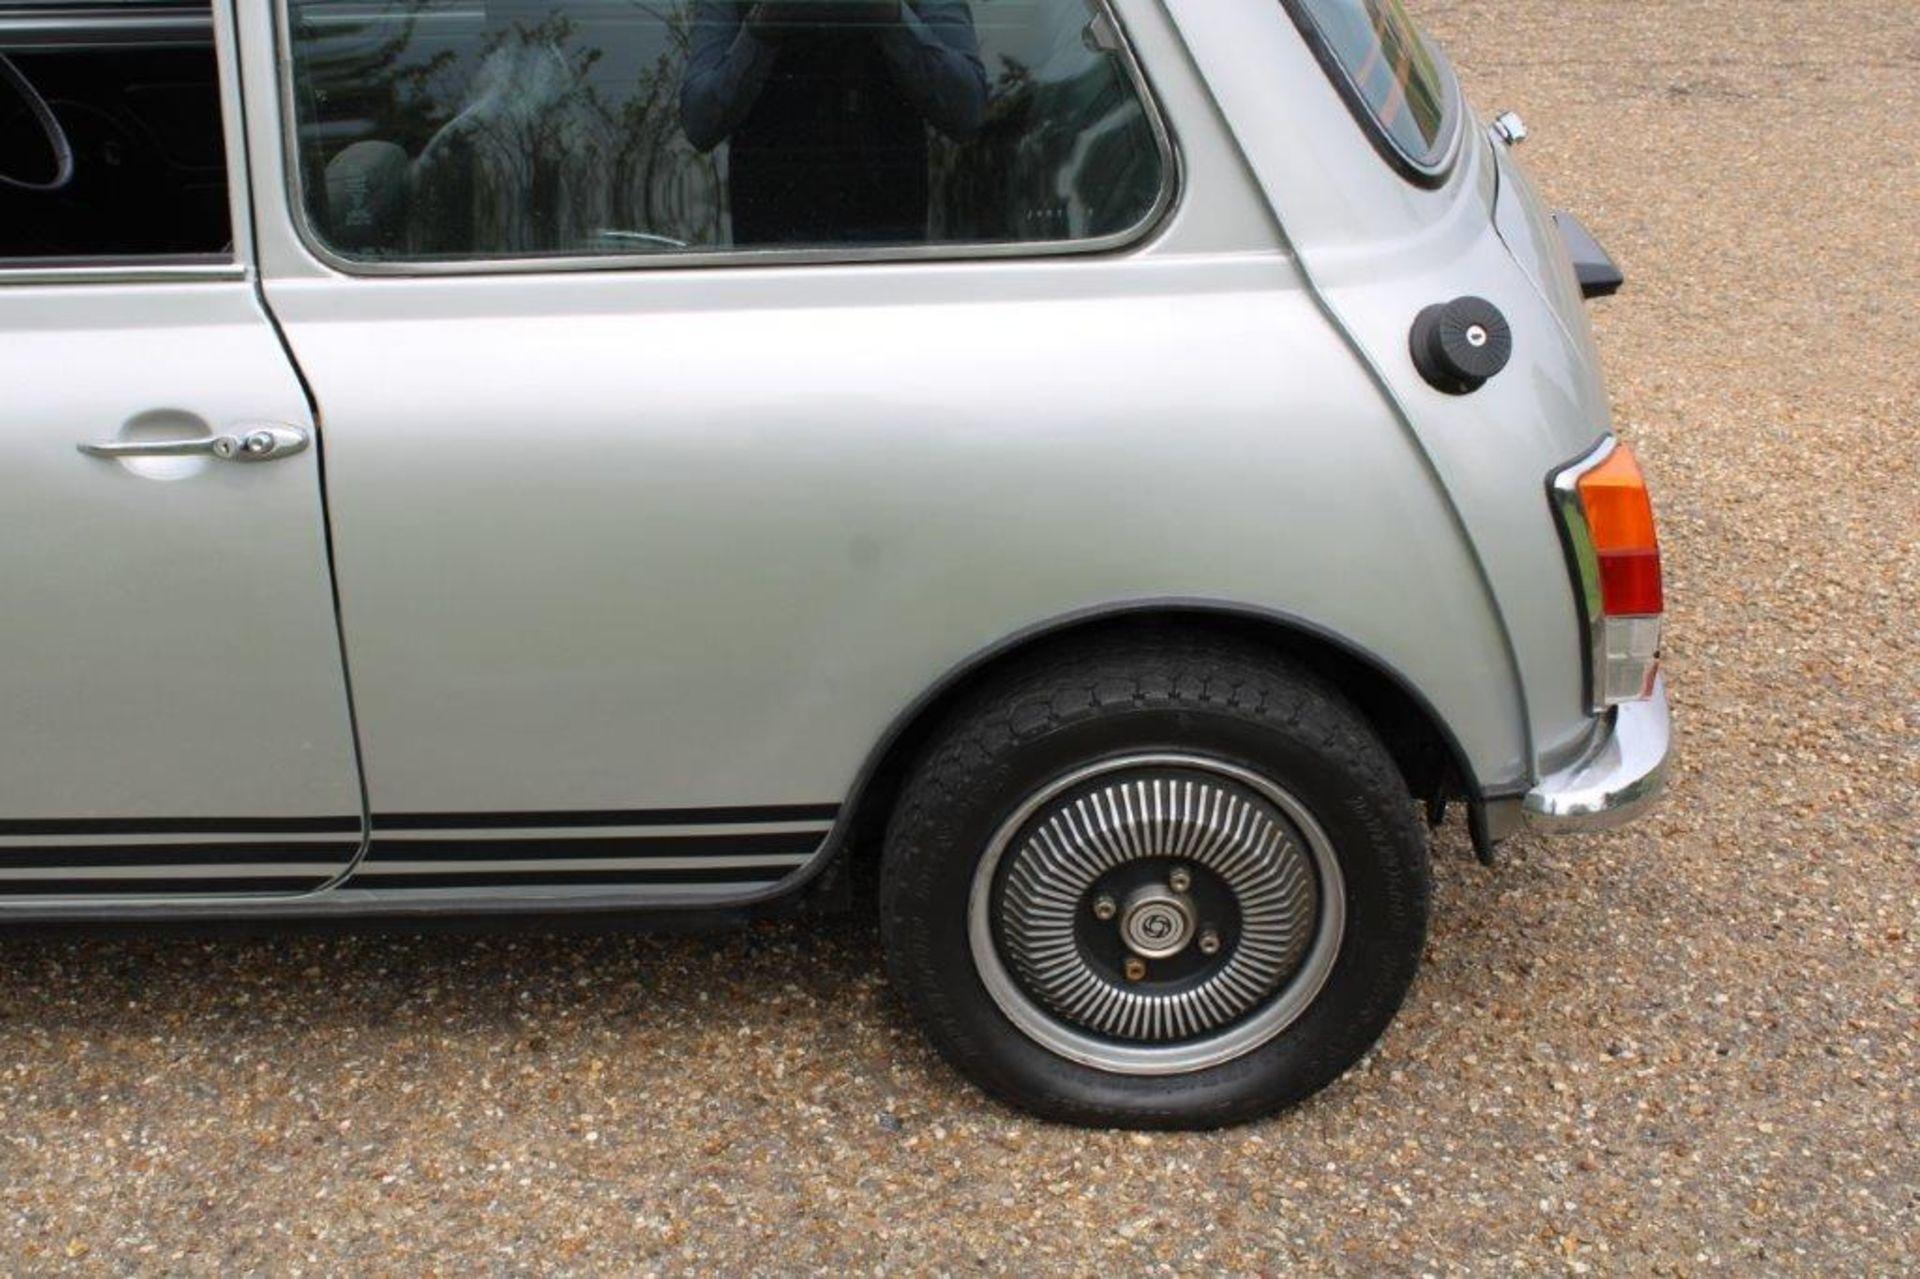 1980 Austin Morris Mini 1275 GT - Image 10 of 28